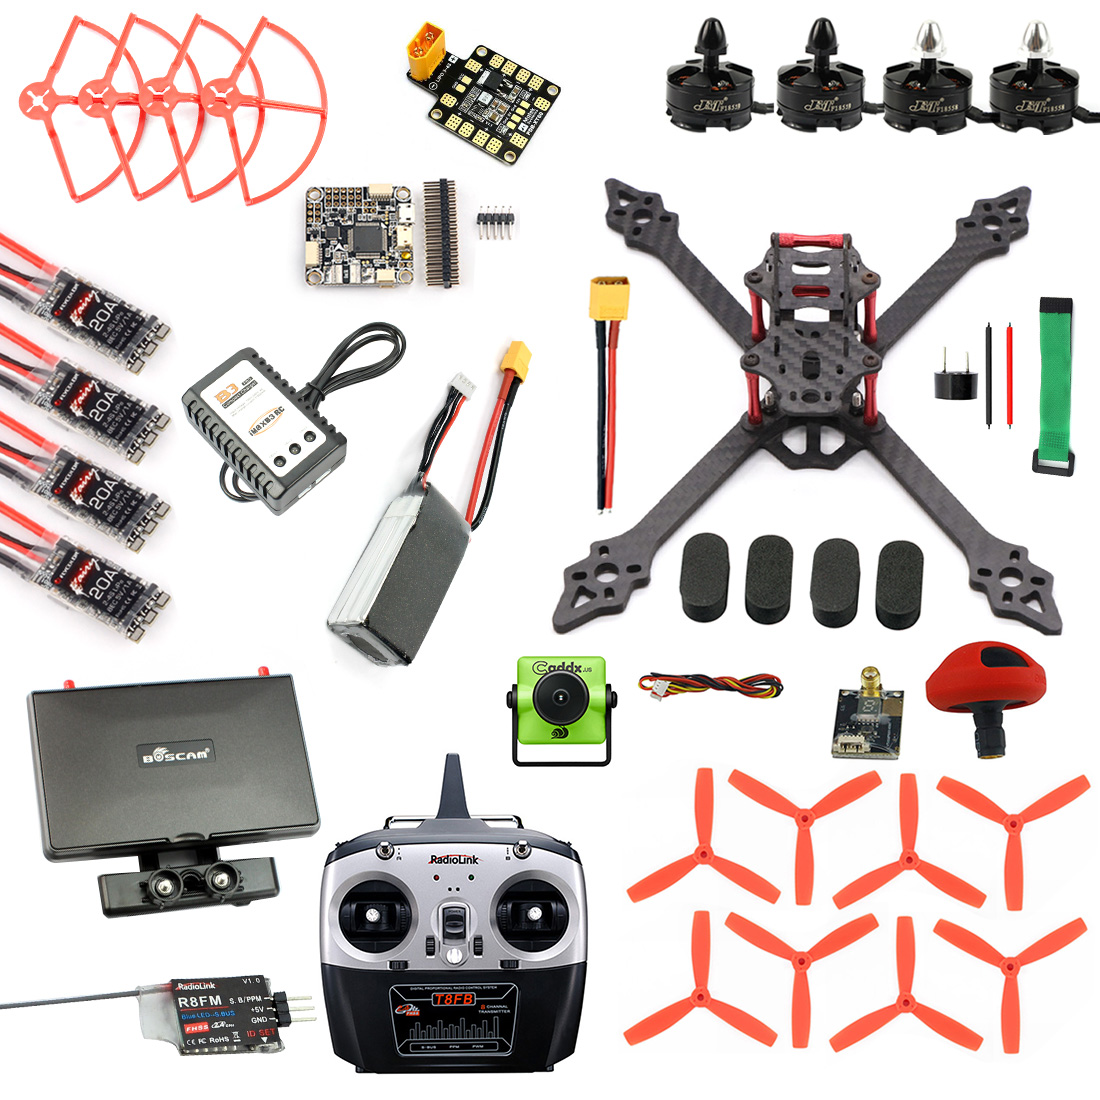 Racer Drone Brushless Camera Quadcopter Betaflight RC FPV Monitor VTX Pro XSR220 F4 3S